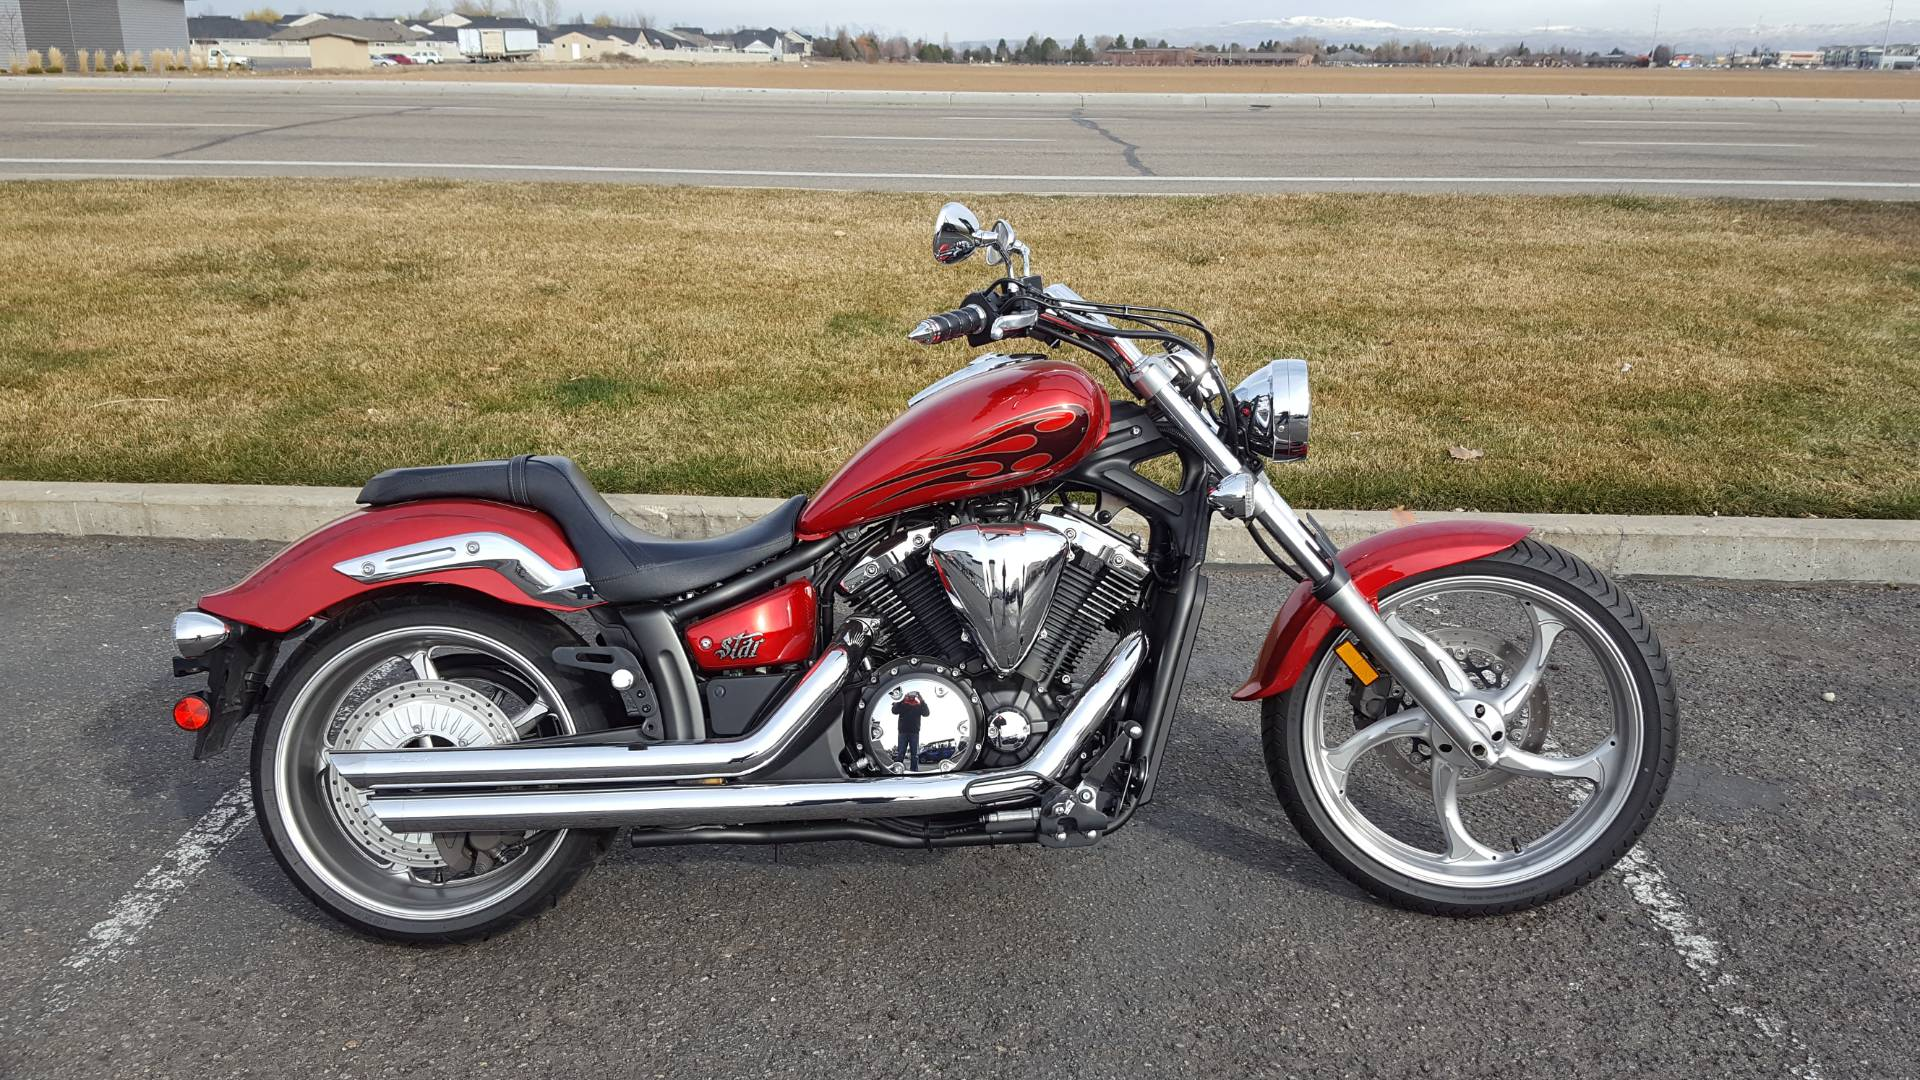 2012 Yamaha Stryker for sale 124089